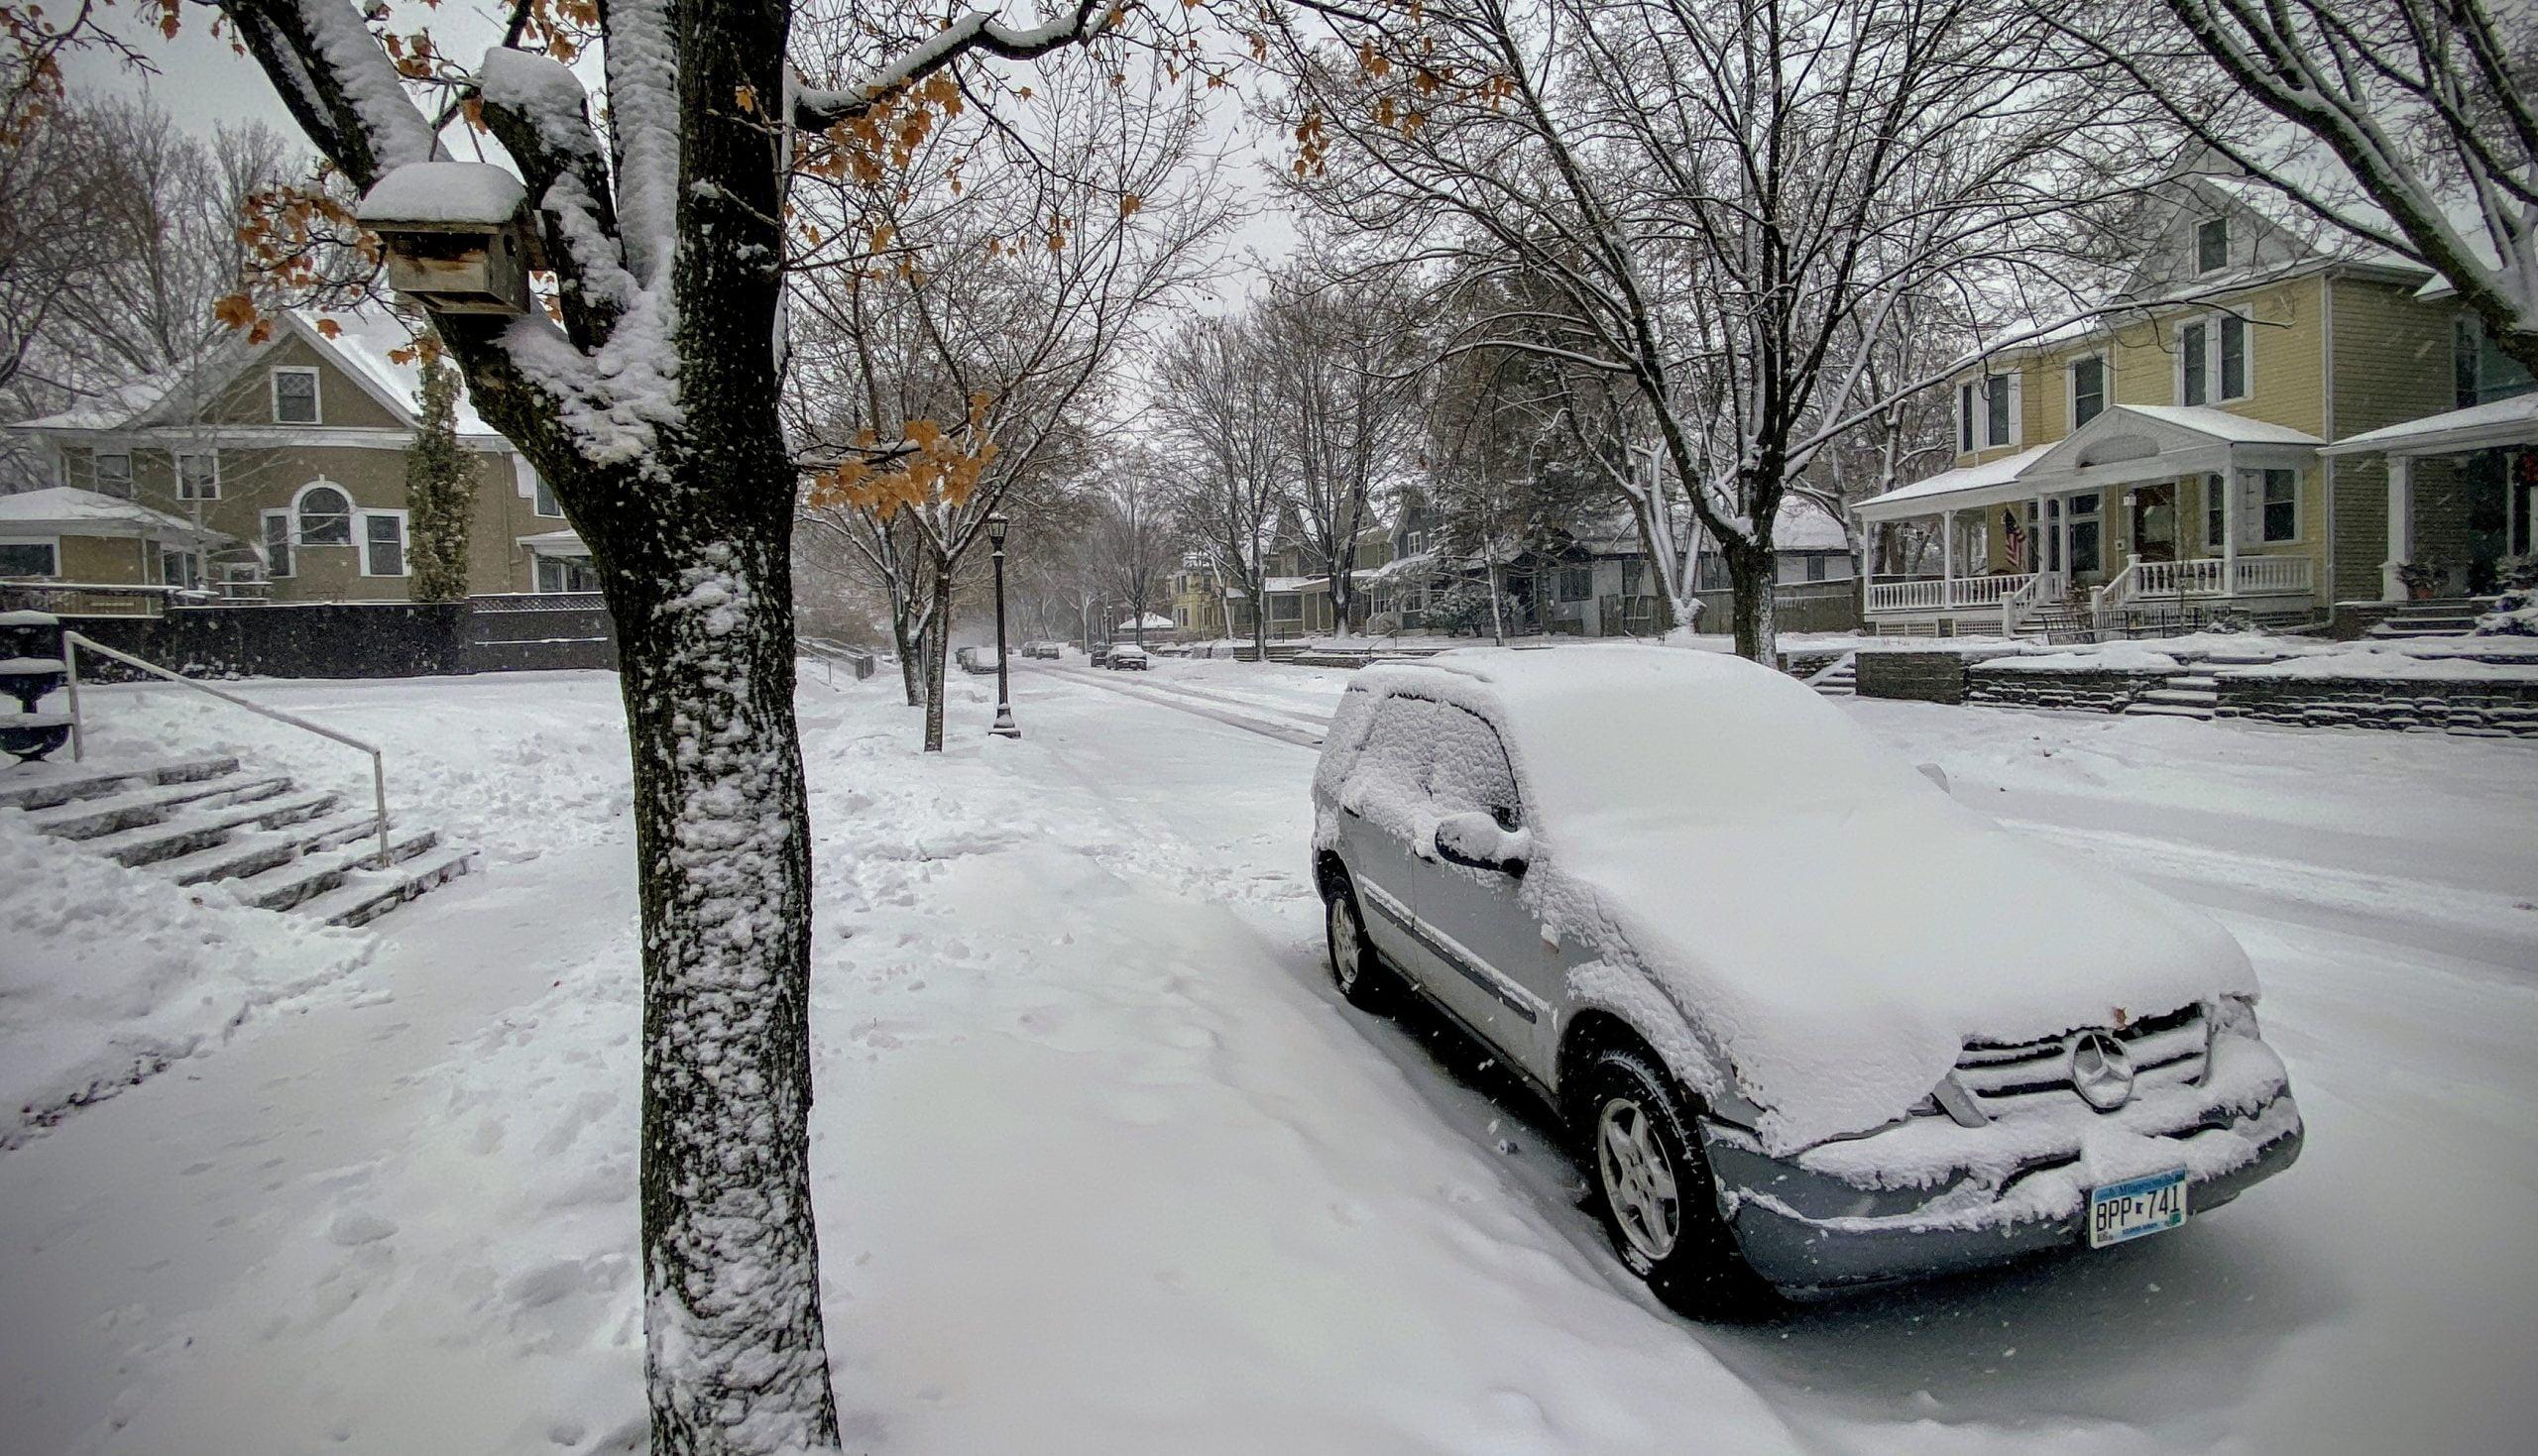 Waukee Snow Emergency Parking Ban Declared 7